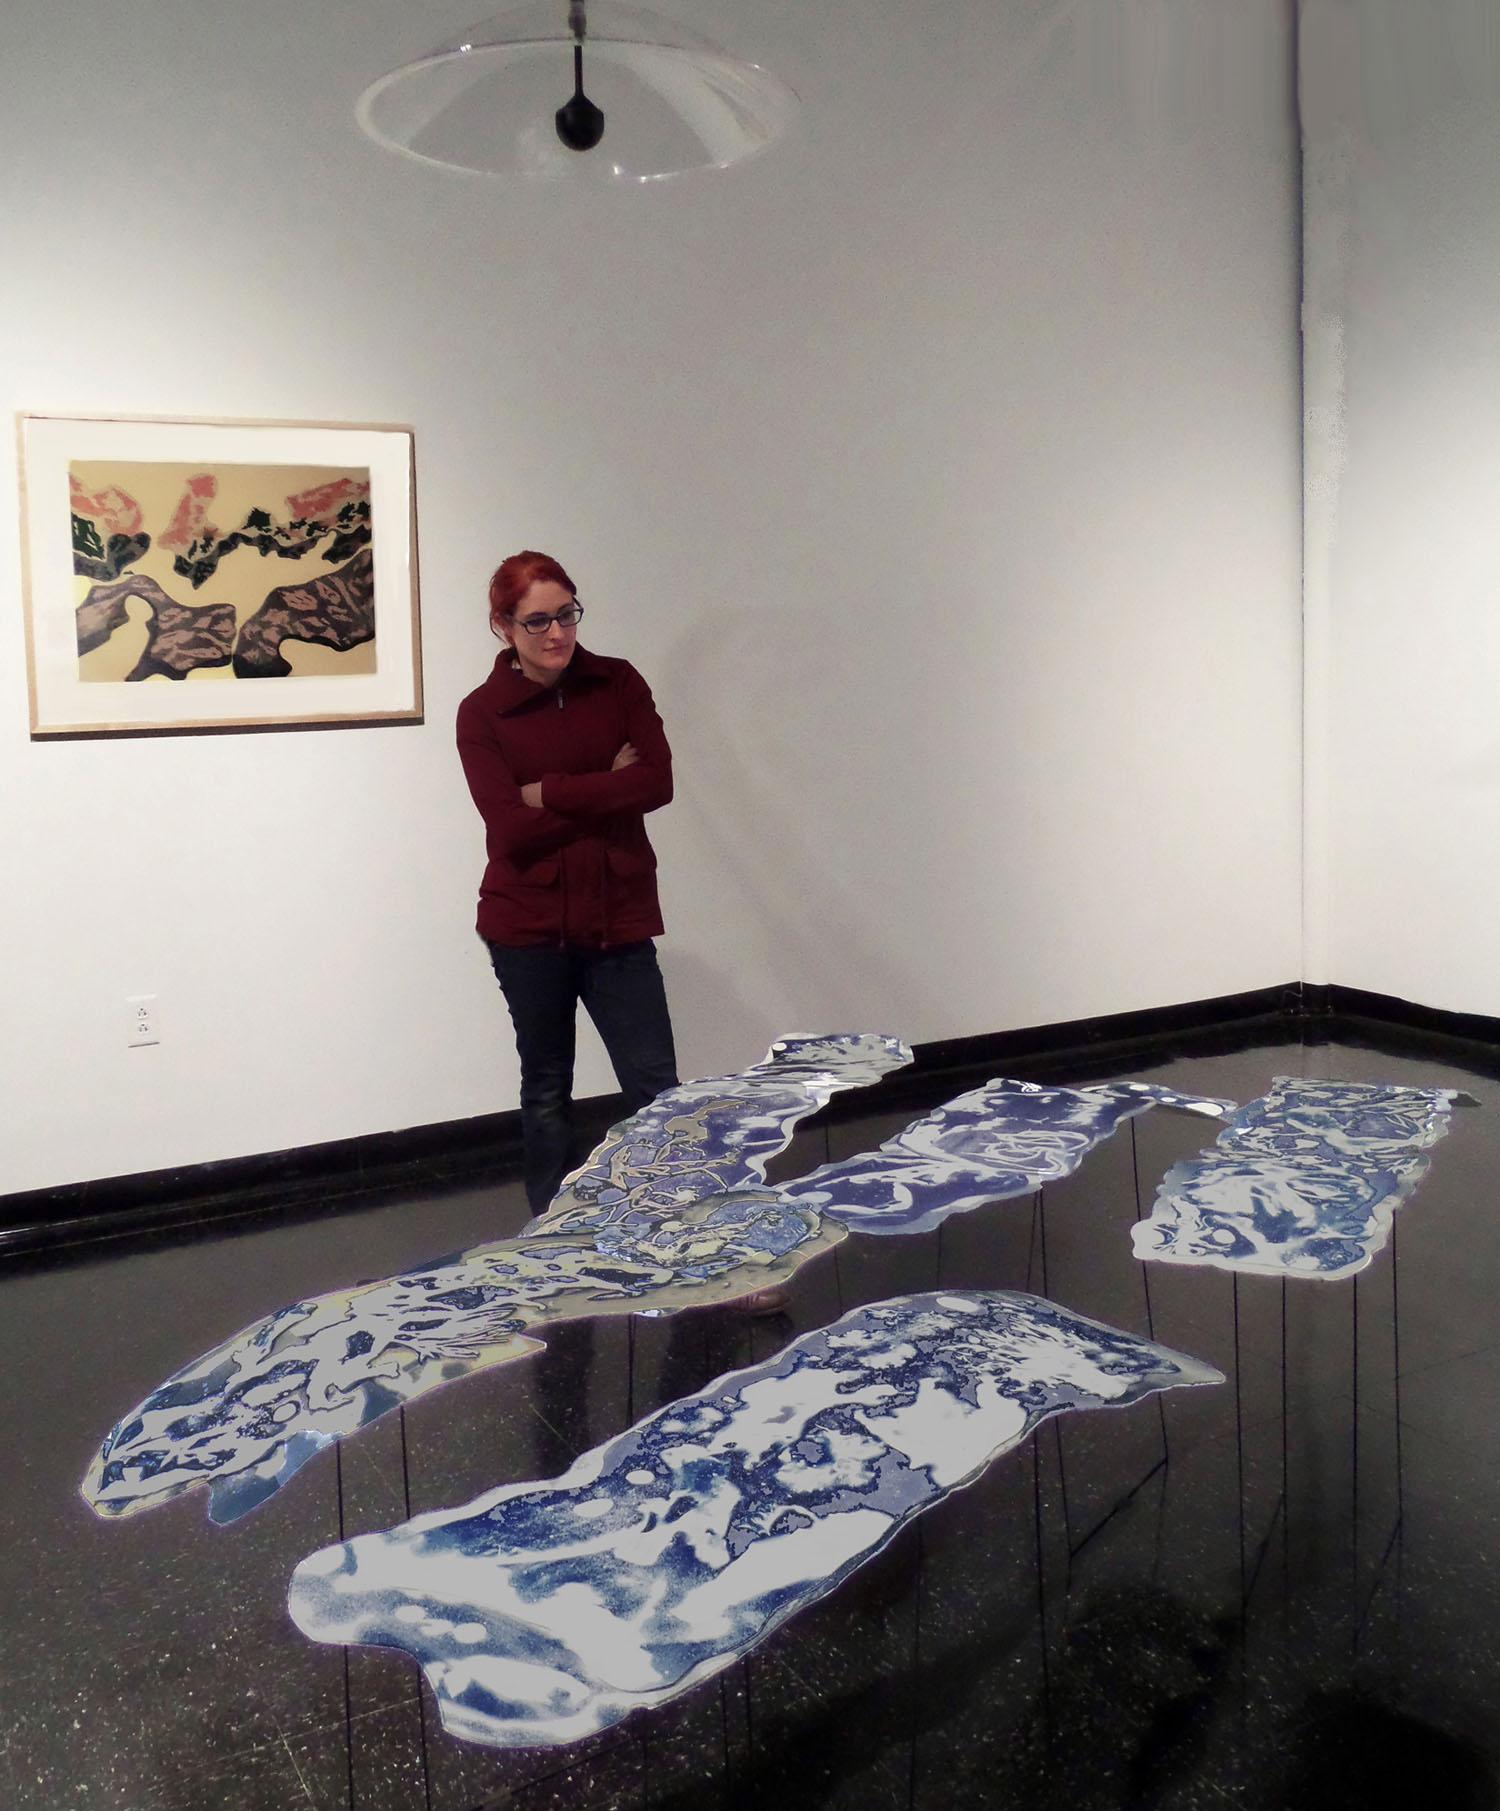 Thesis Exhibit, UMass Dartmouth, screen print + floating cyanotype sculptures